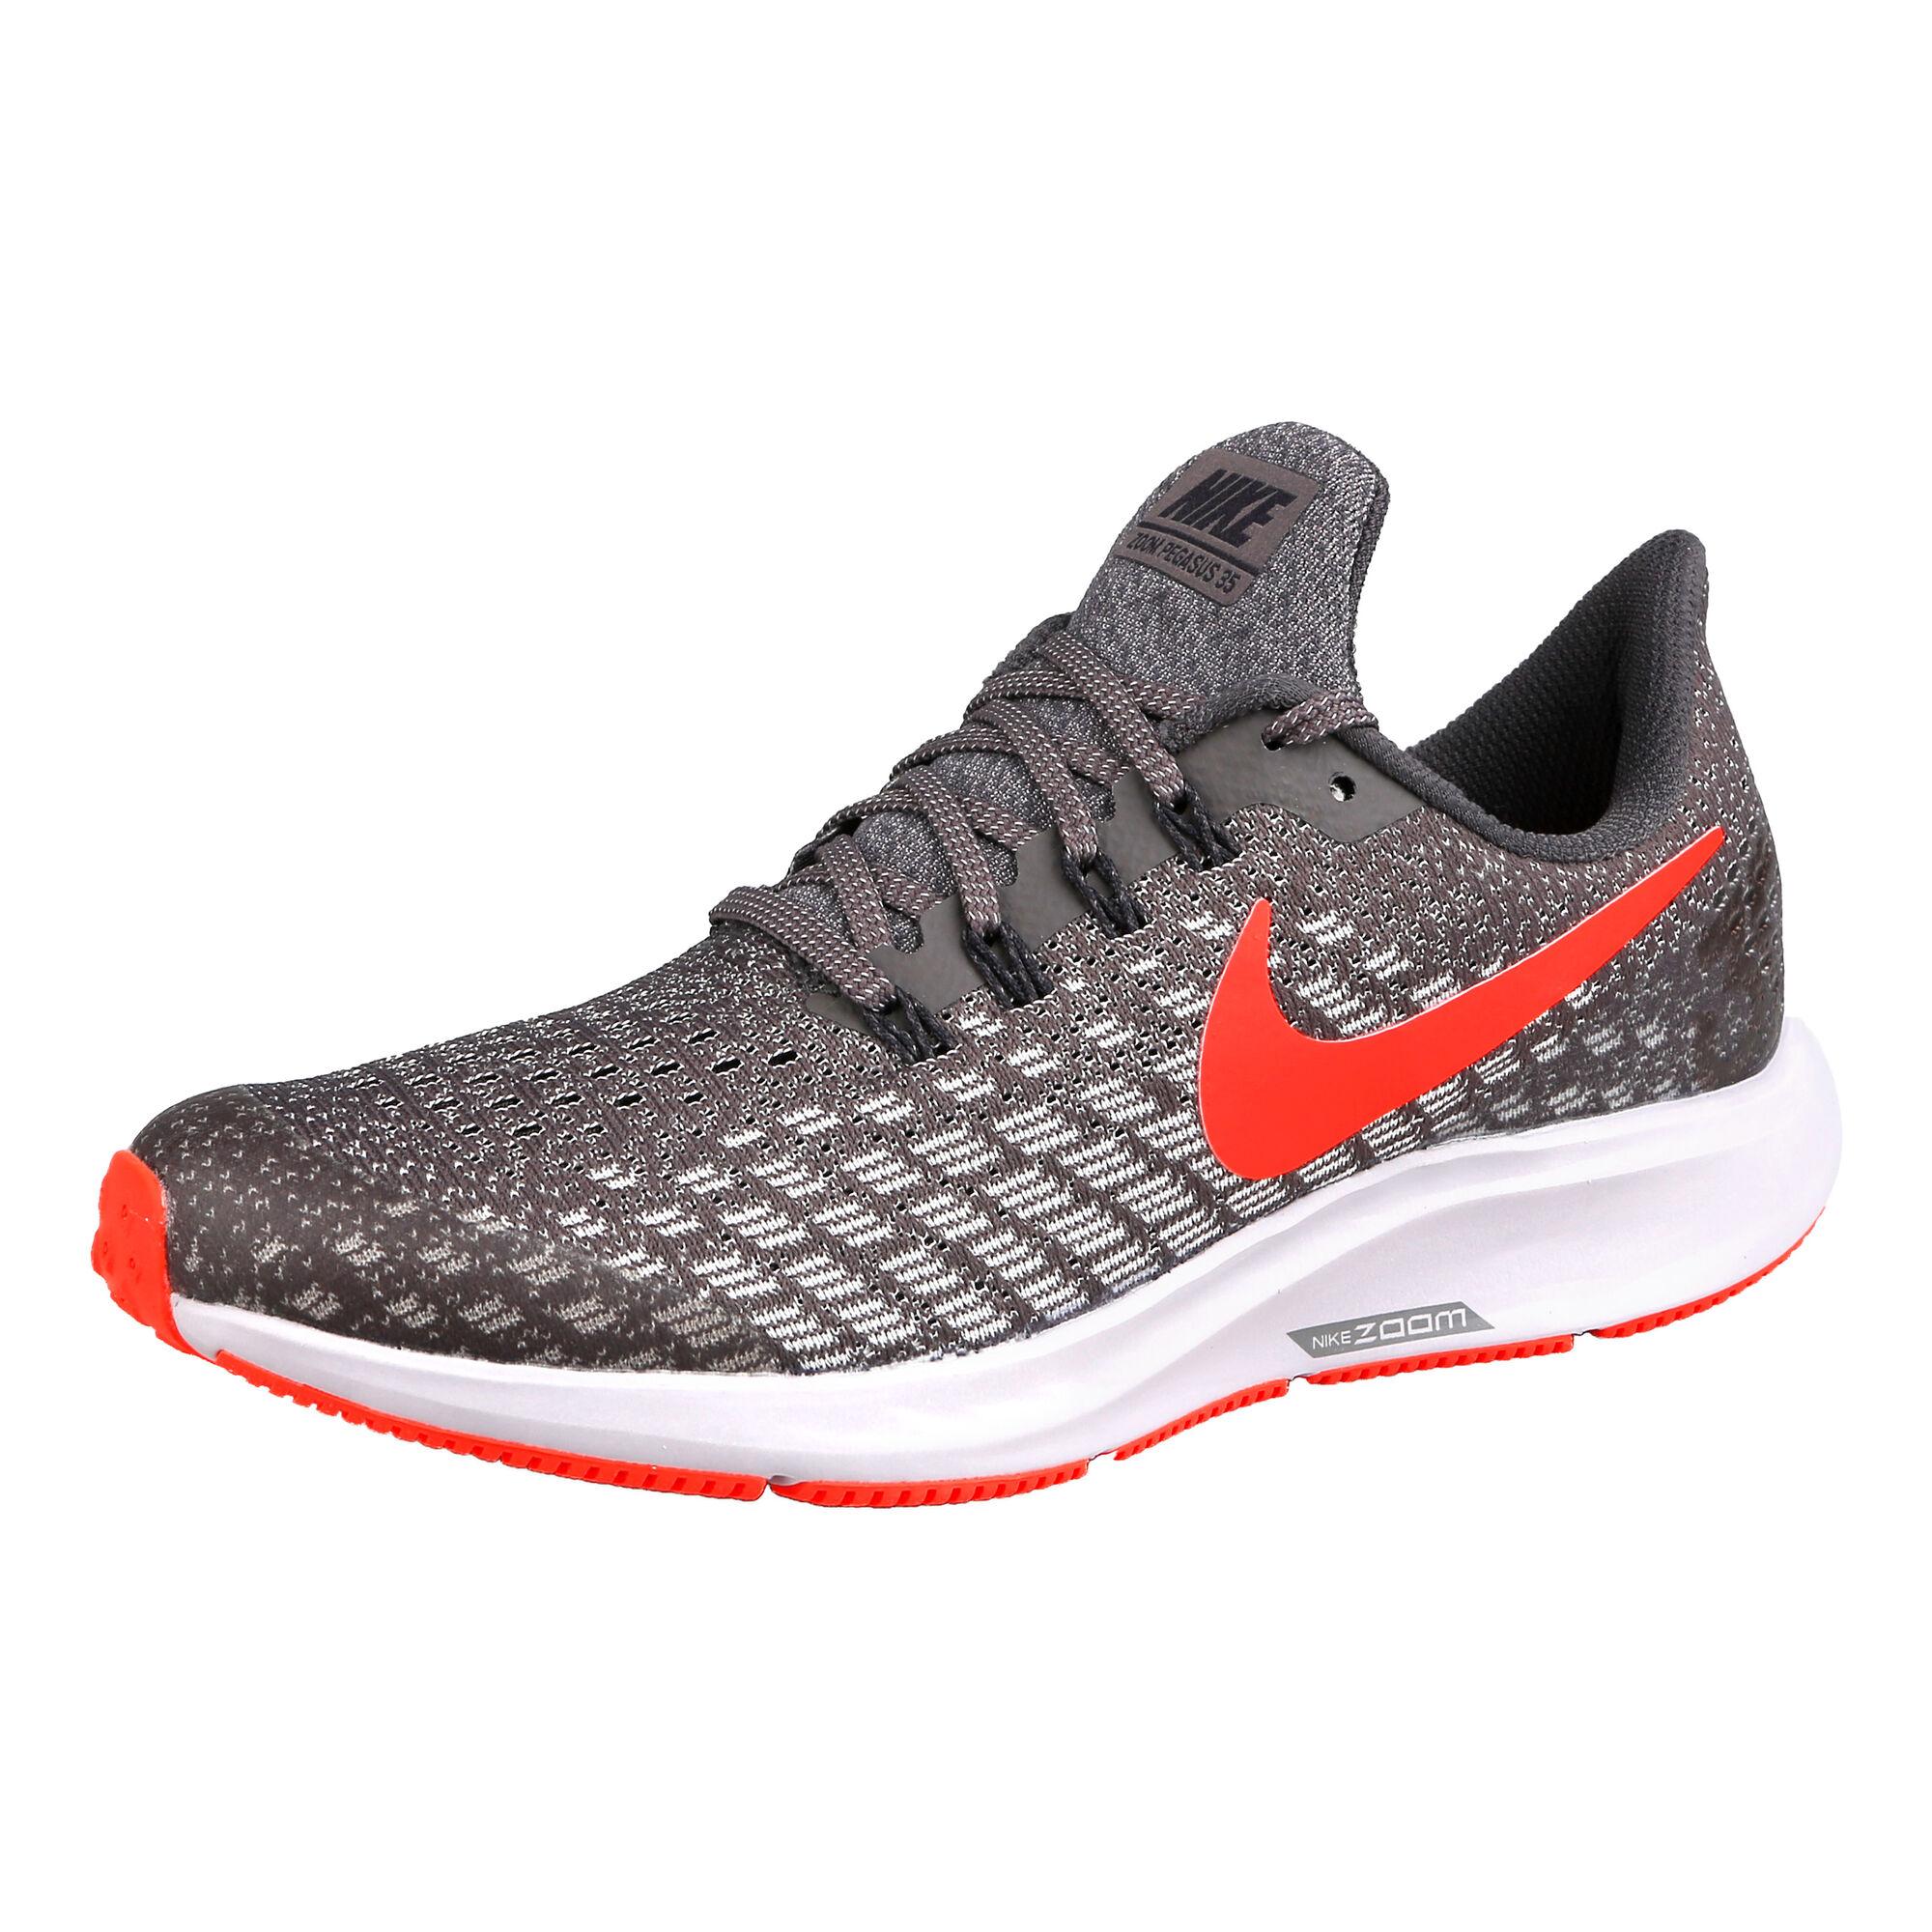 innovative design ff708 98e50 buy Nike Air Zoom Pegasus 35 GS Neutral Running Shoe Kids ...